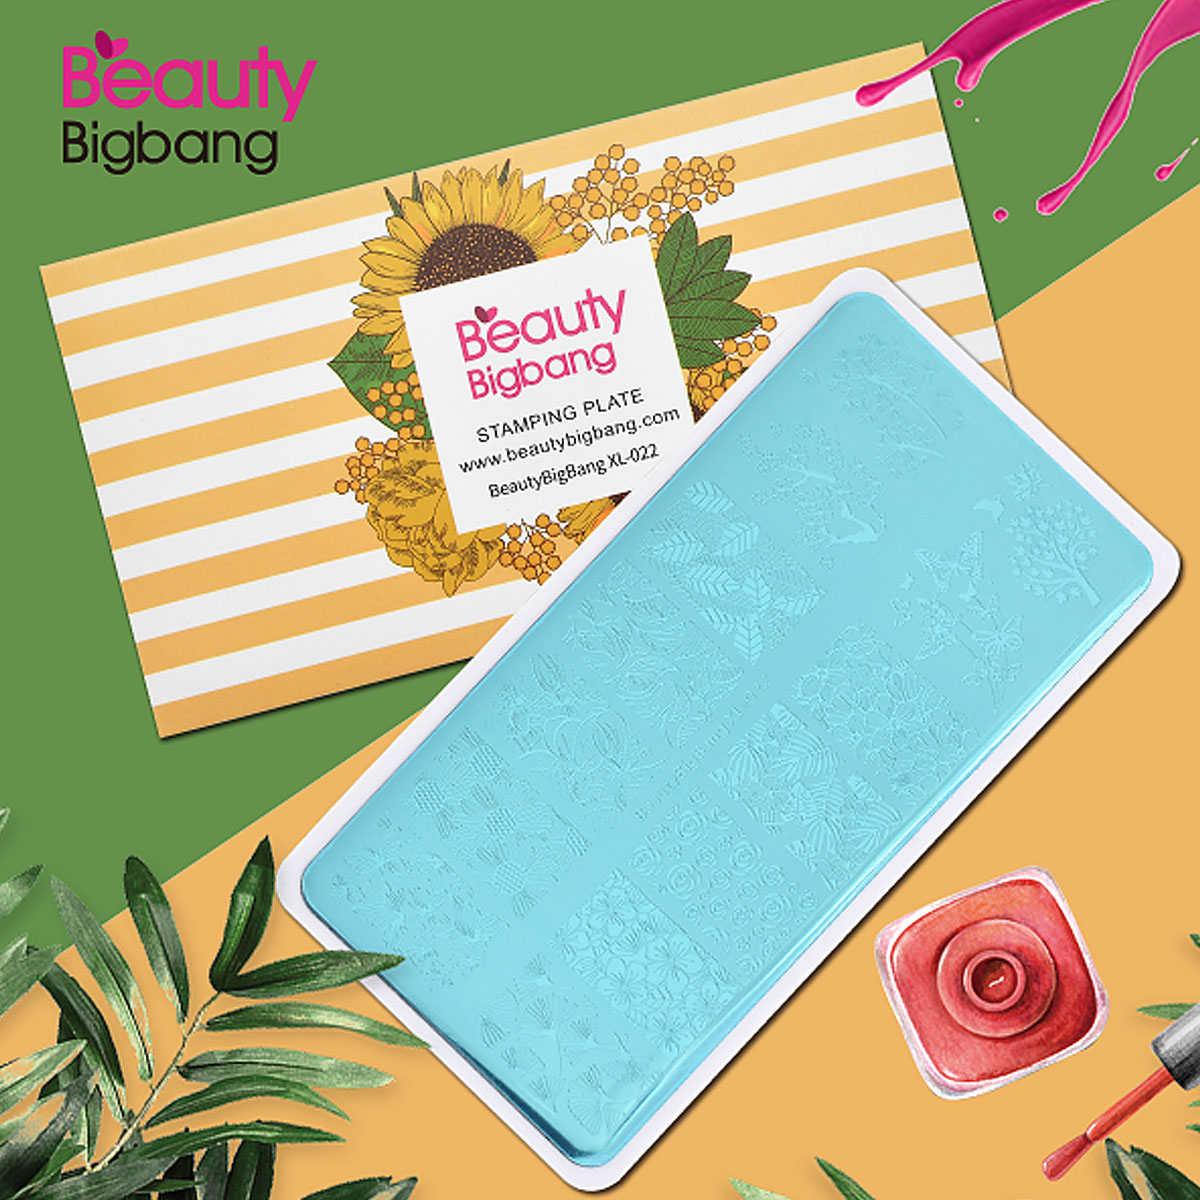 BeautyBigBang 6*12 ซม.สี่เหลี่ยมผืนผ้าแผ่นปั๊มเล็บธีมฤดูใบไม้ร่วง STAMP Template Stencils เล็บเล็บเครื่องมือ